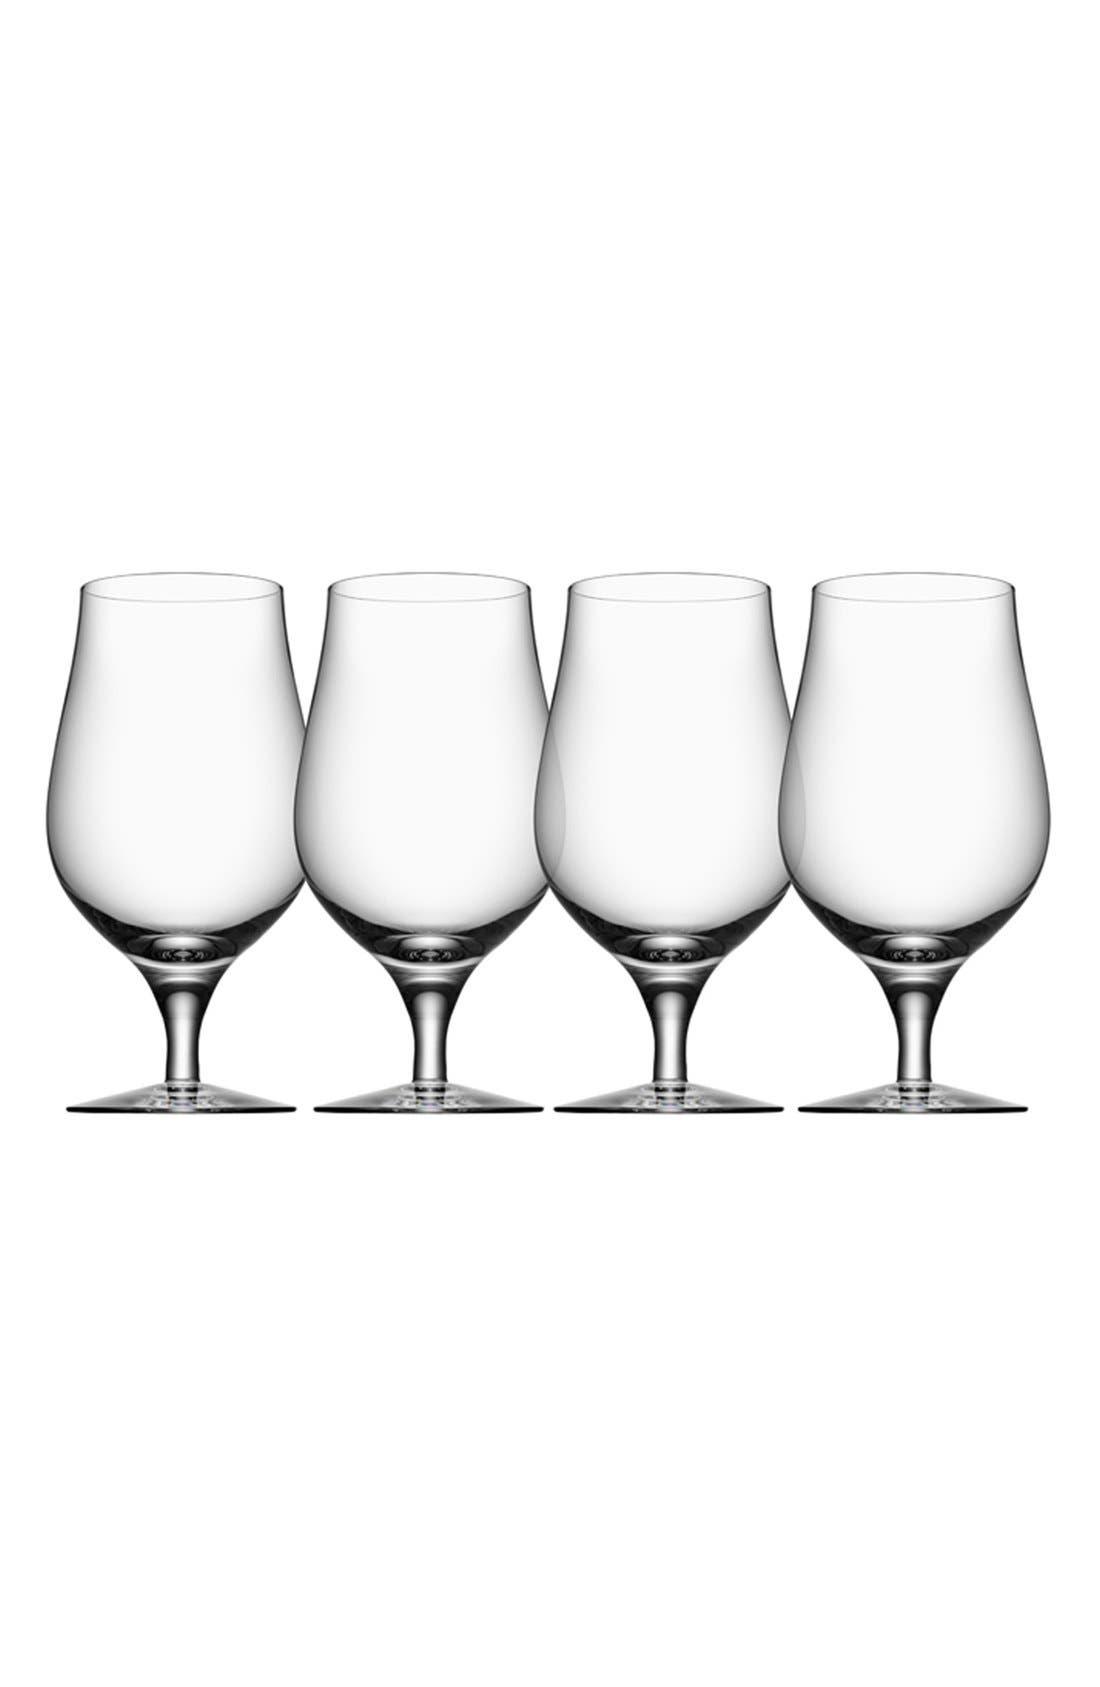 'Taster' Glasses,                         Main,                         color, 100